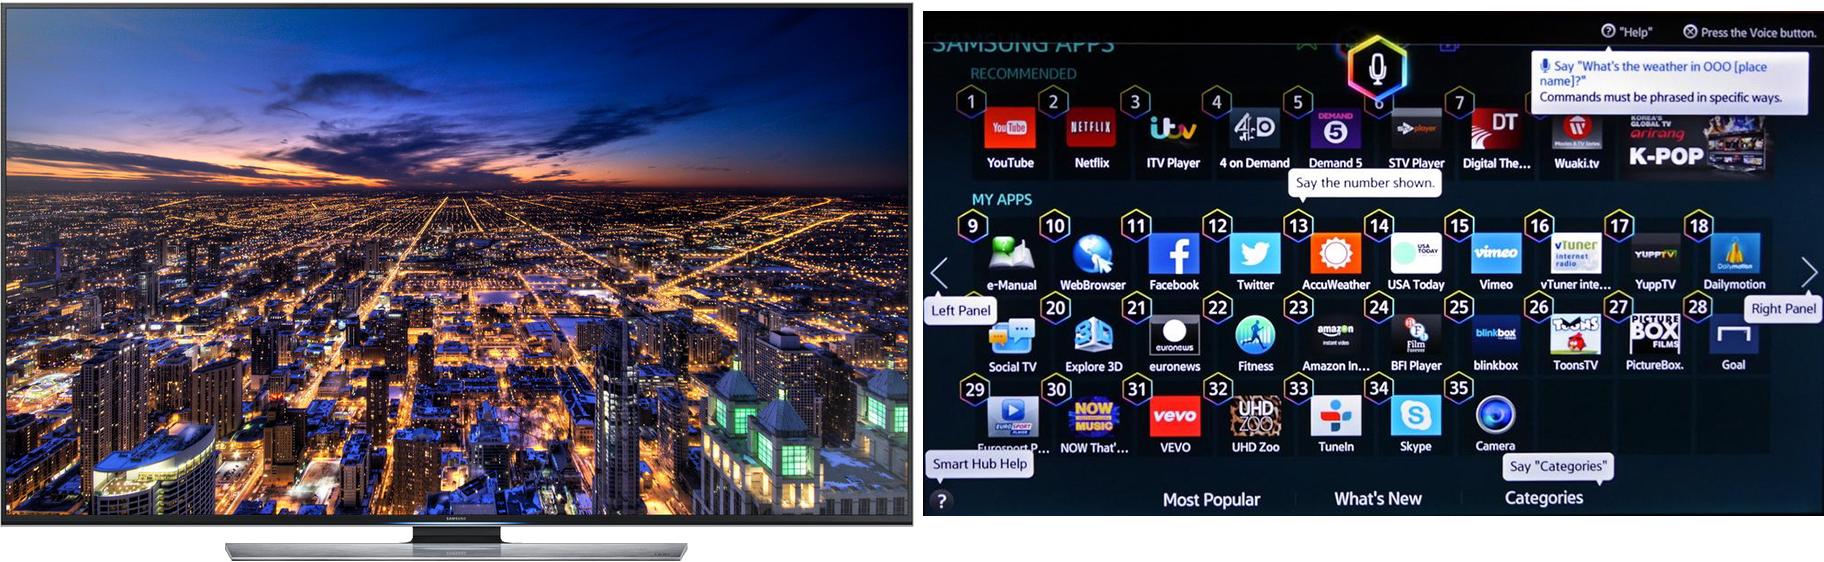 Samsung 48HU7500 4K Ultra HD 3D Smart TV -3- ilovesamsung